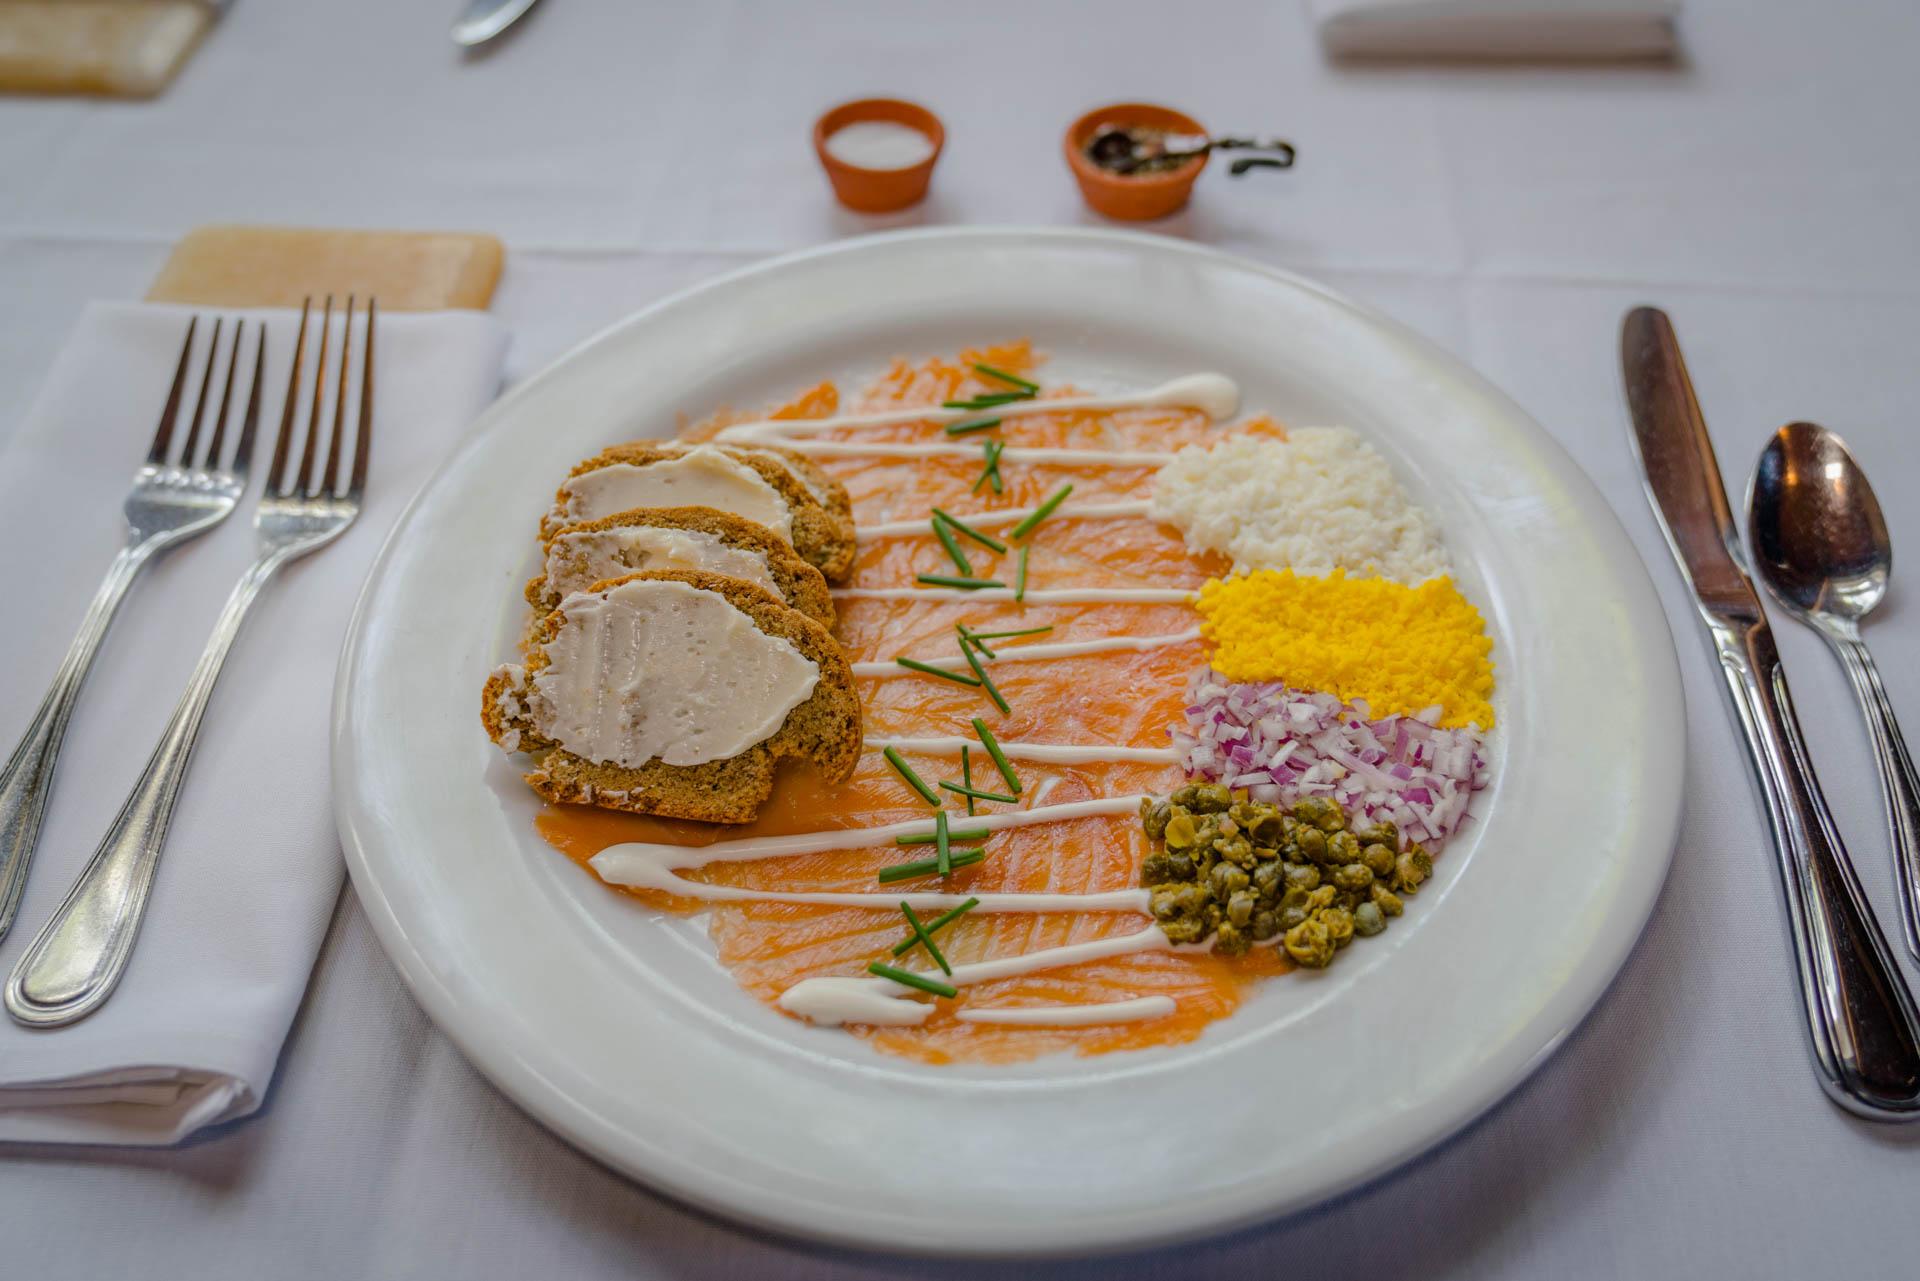 Dinner at Mulvaney's B&L in Sacramento, CA